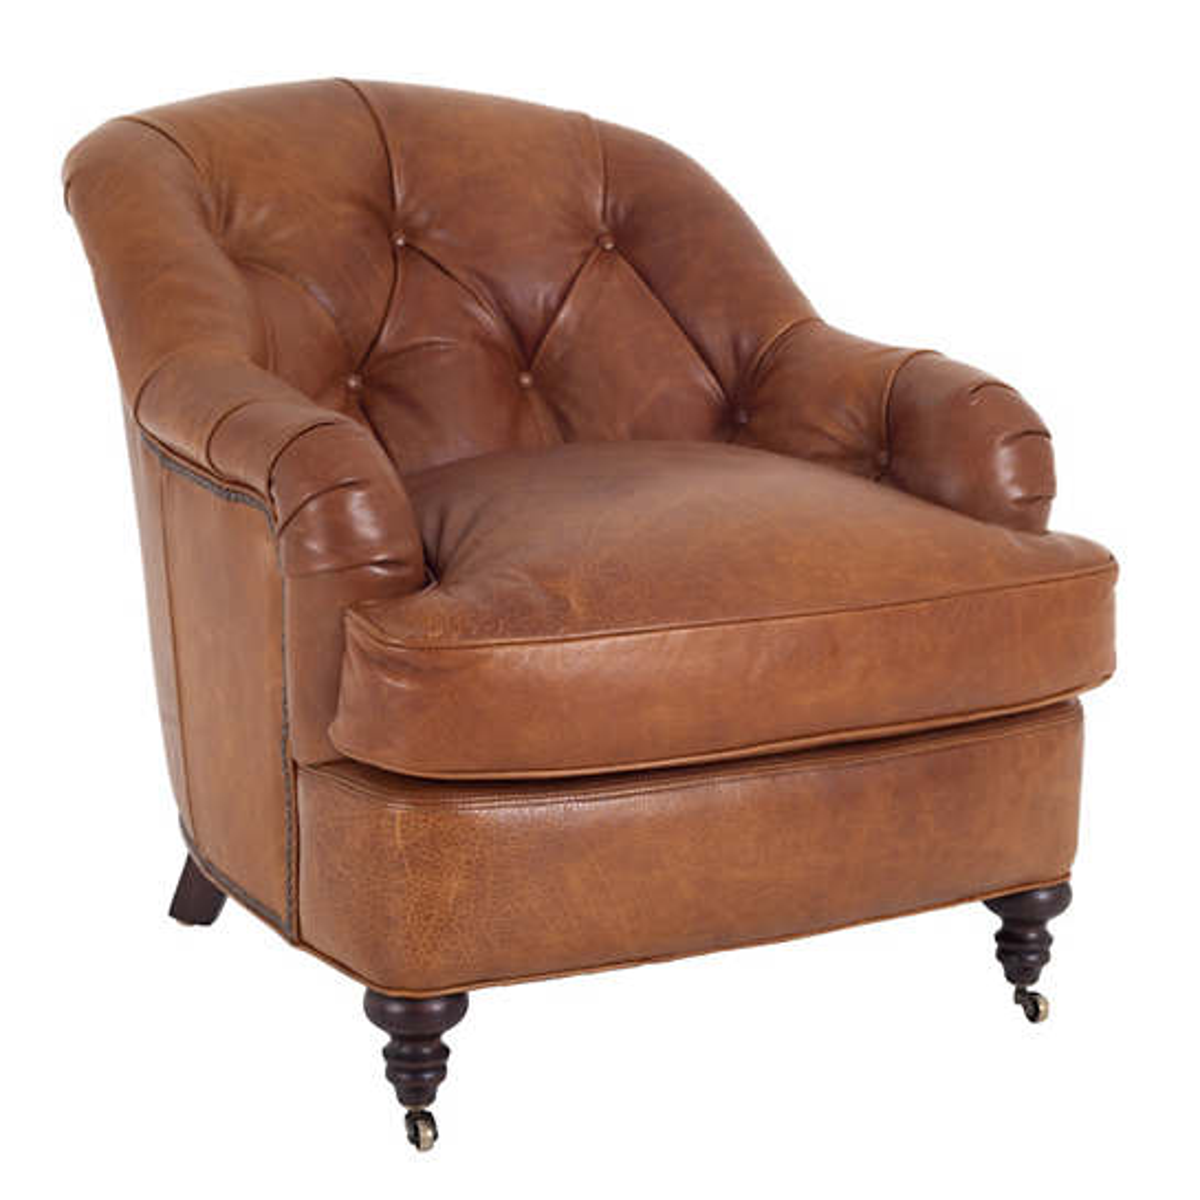 Madrid Chestnut Norfolk Leather Chair